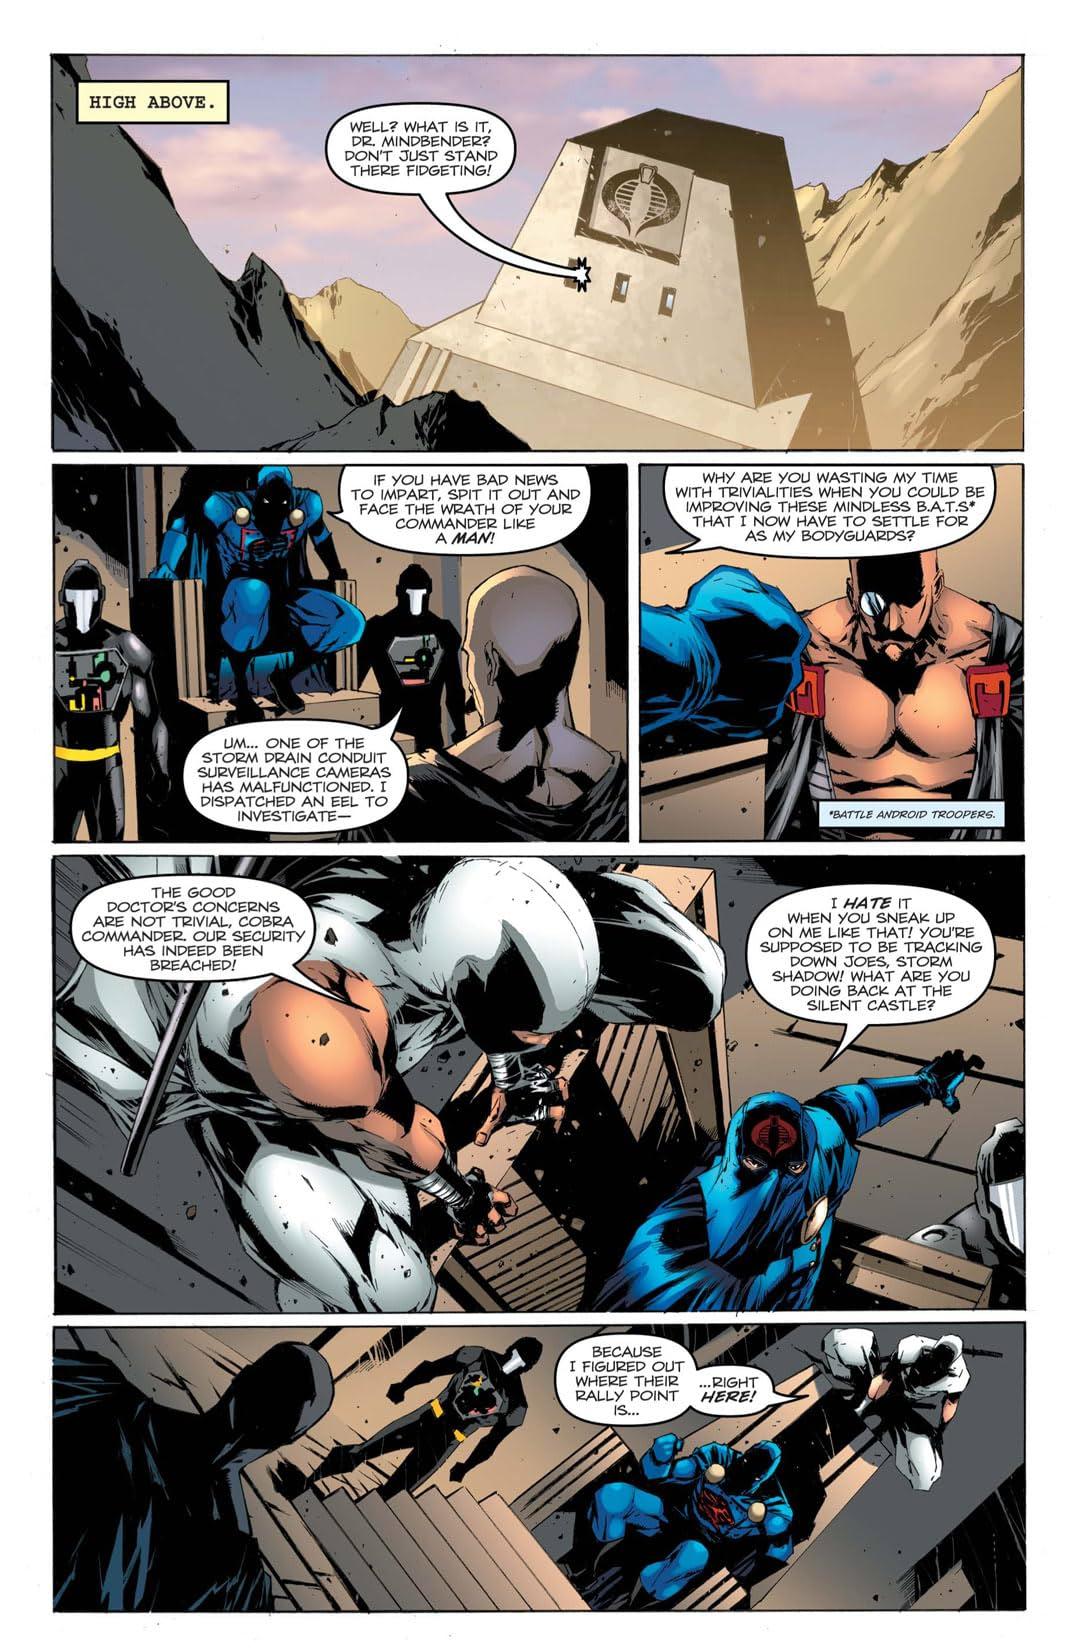 G.I. Joe: A Real American Hero No.158